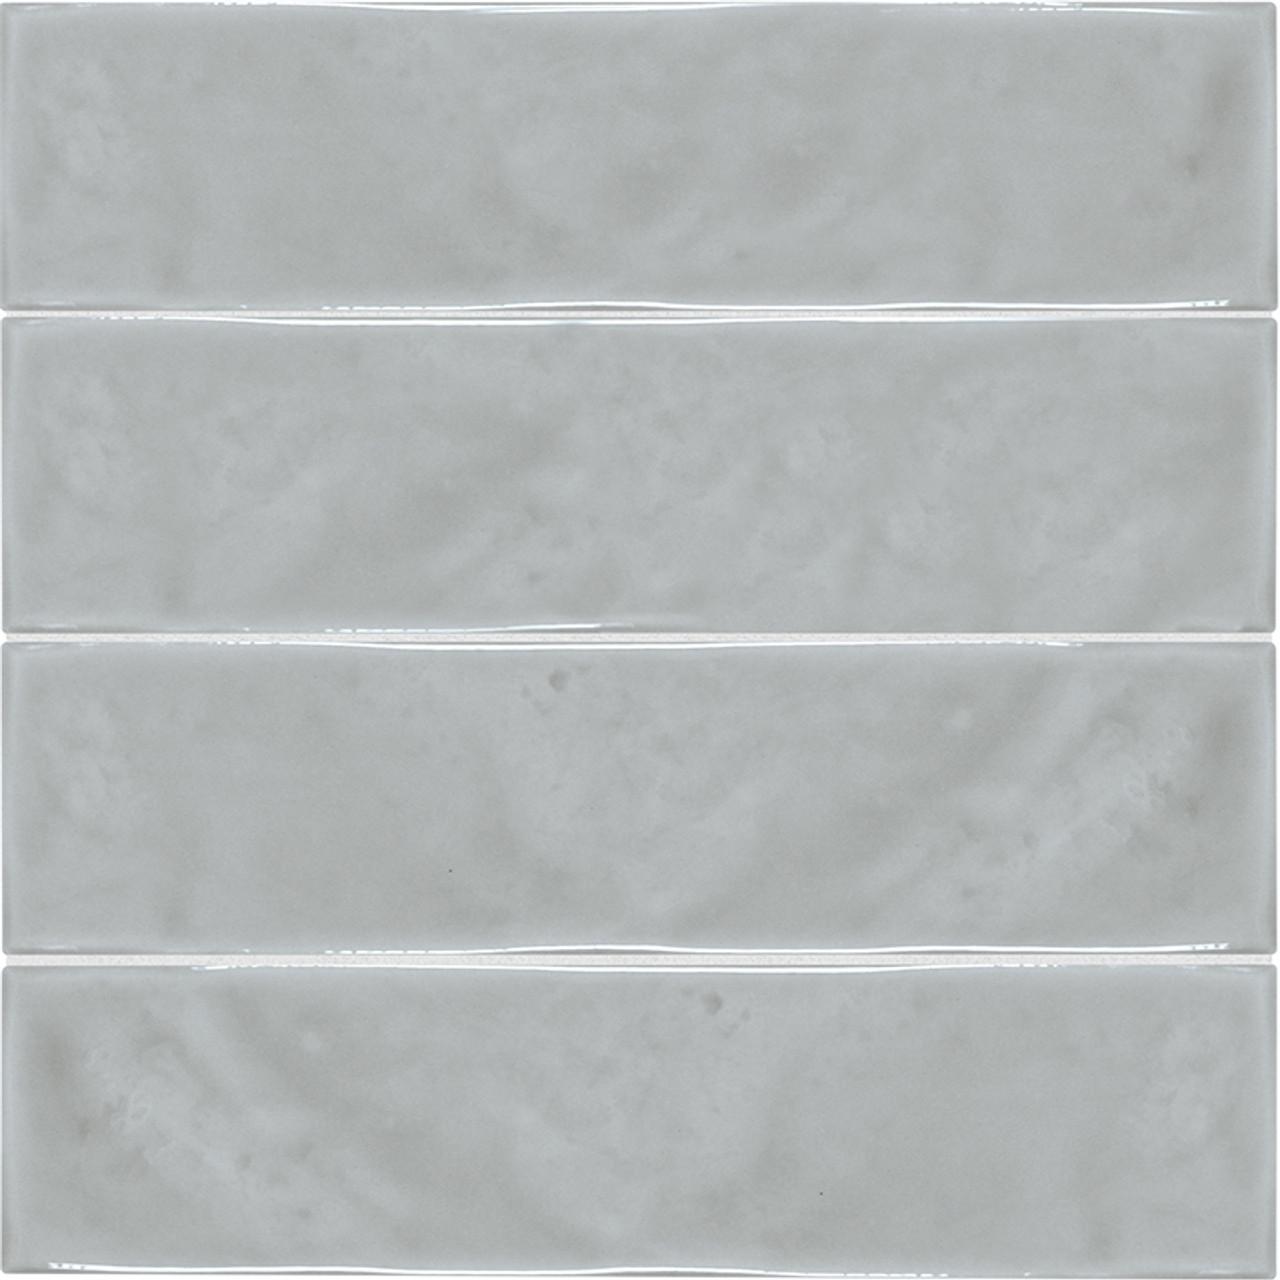 marlow smoke 3x12 glossy wall tile